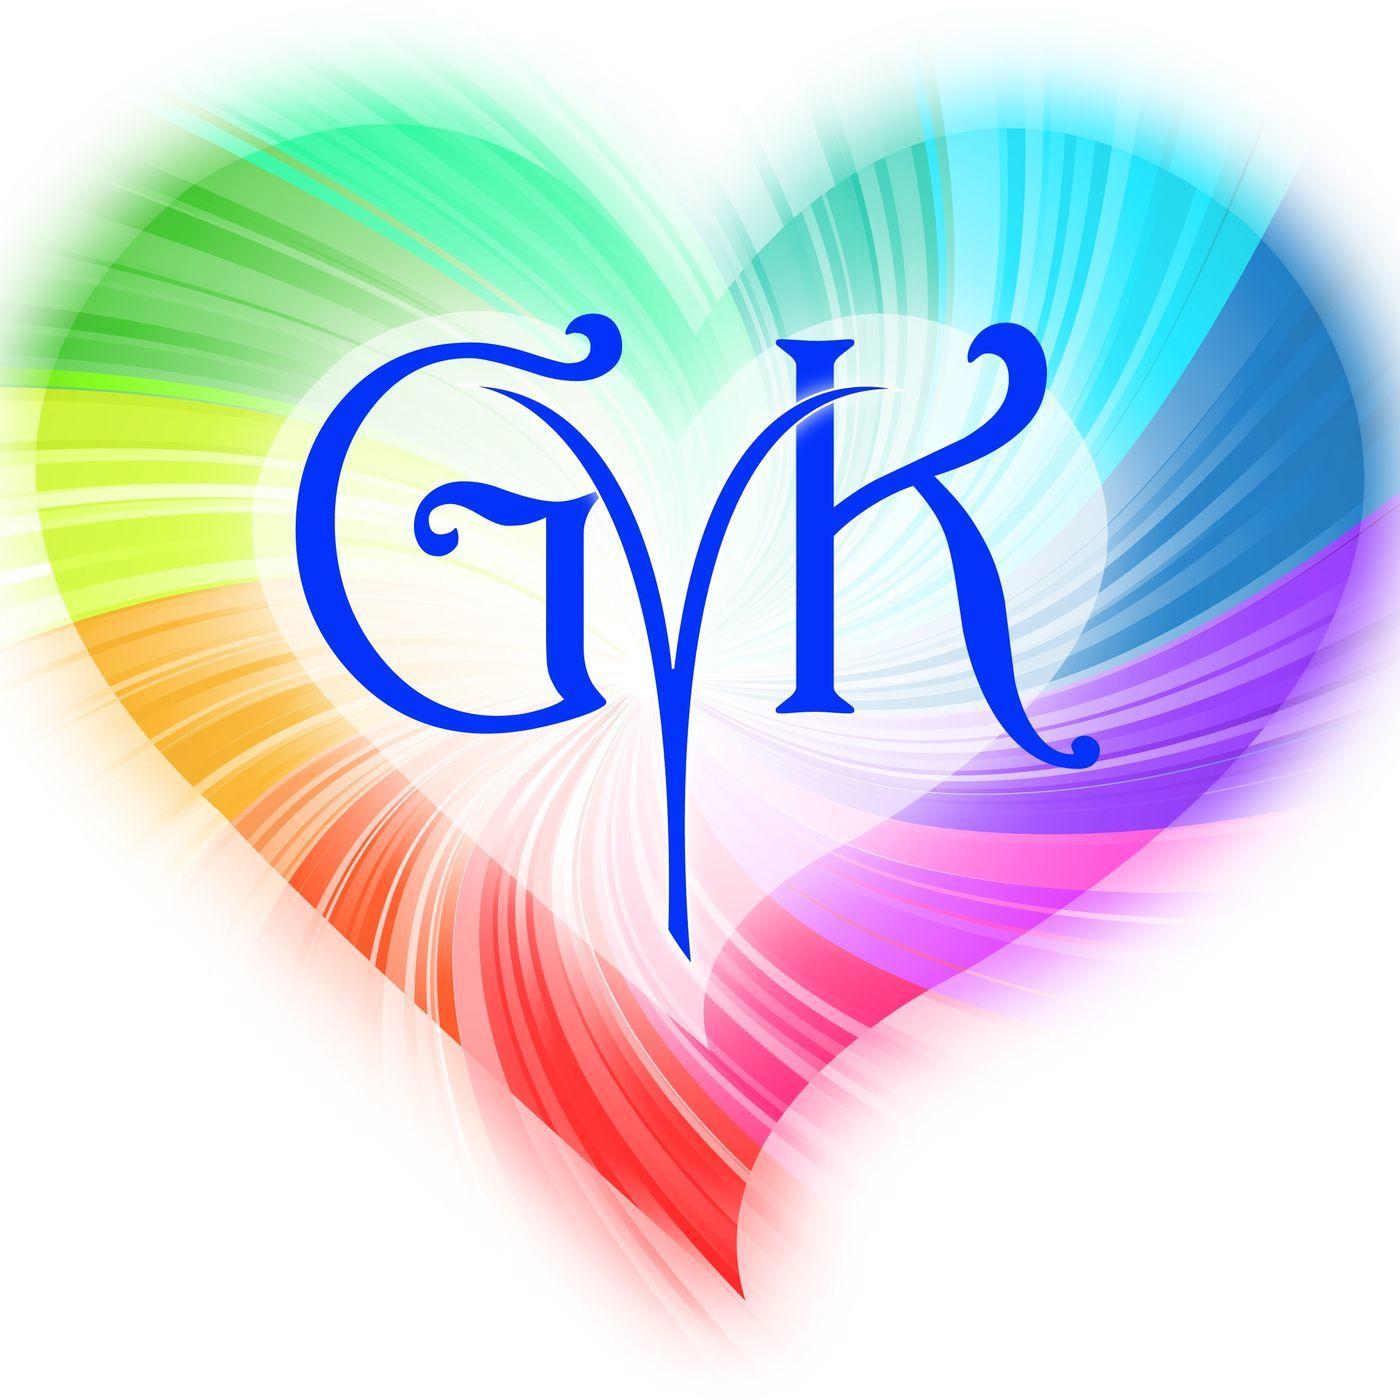 GVK: Kristin on Rising like the Phoenix